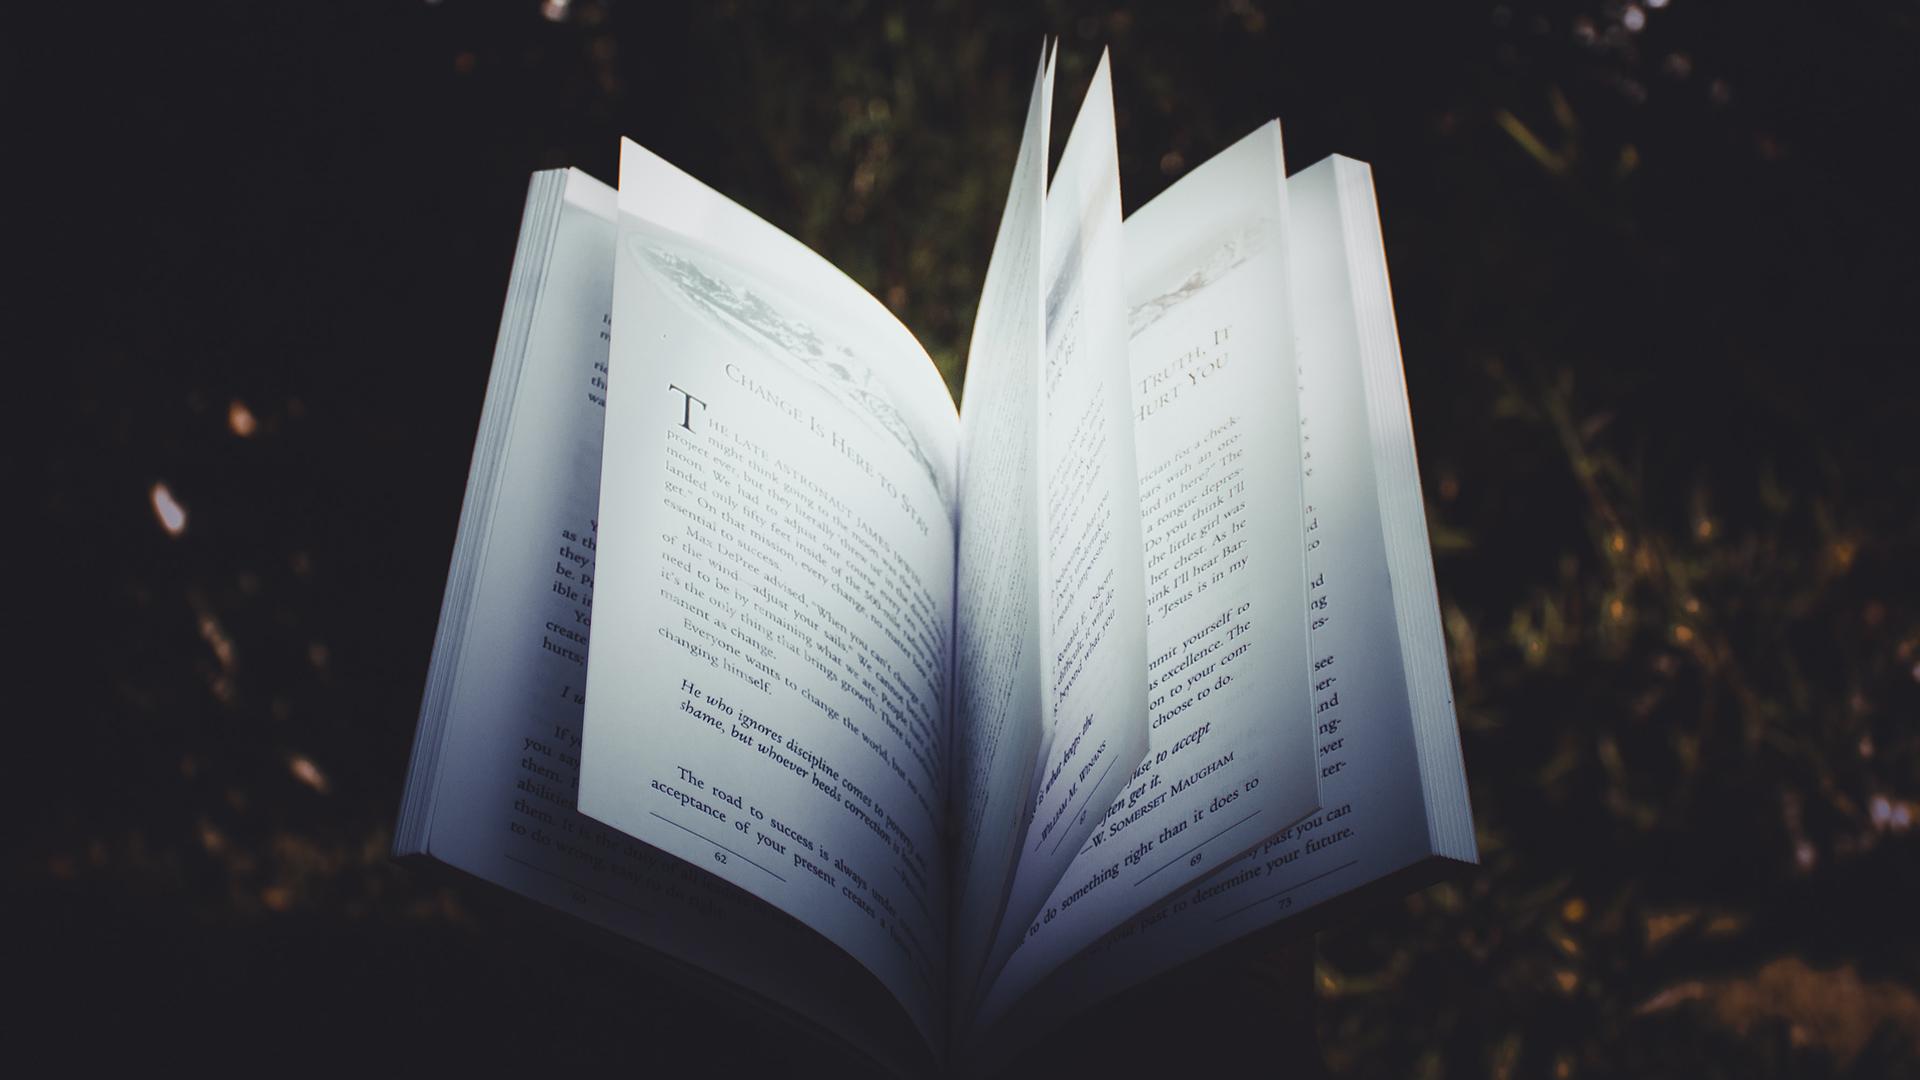 Bina-Qurani-Apa-Yang-Dimaksud-Teks-Eksplanasi